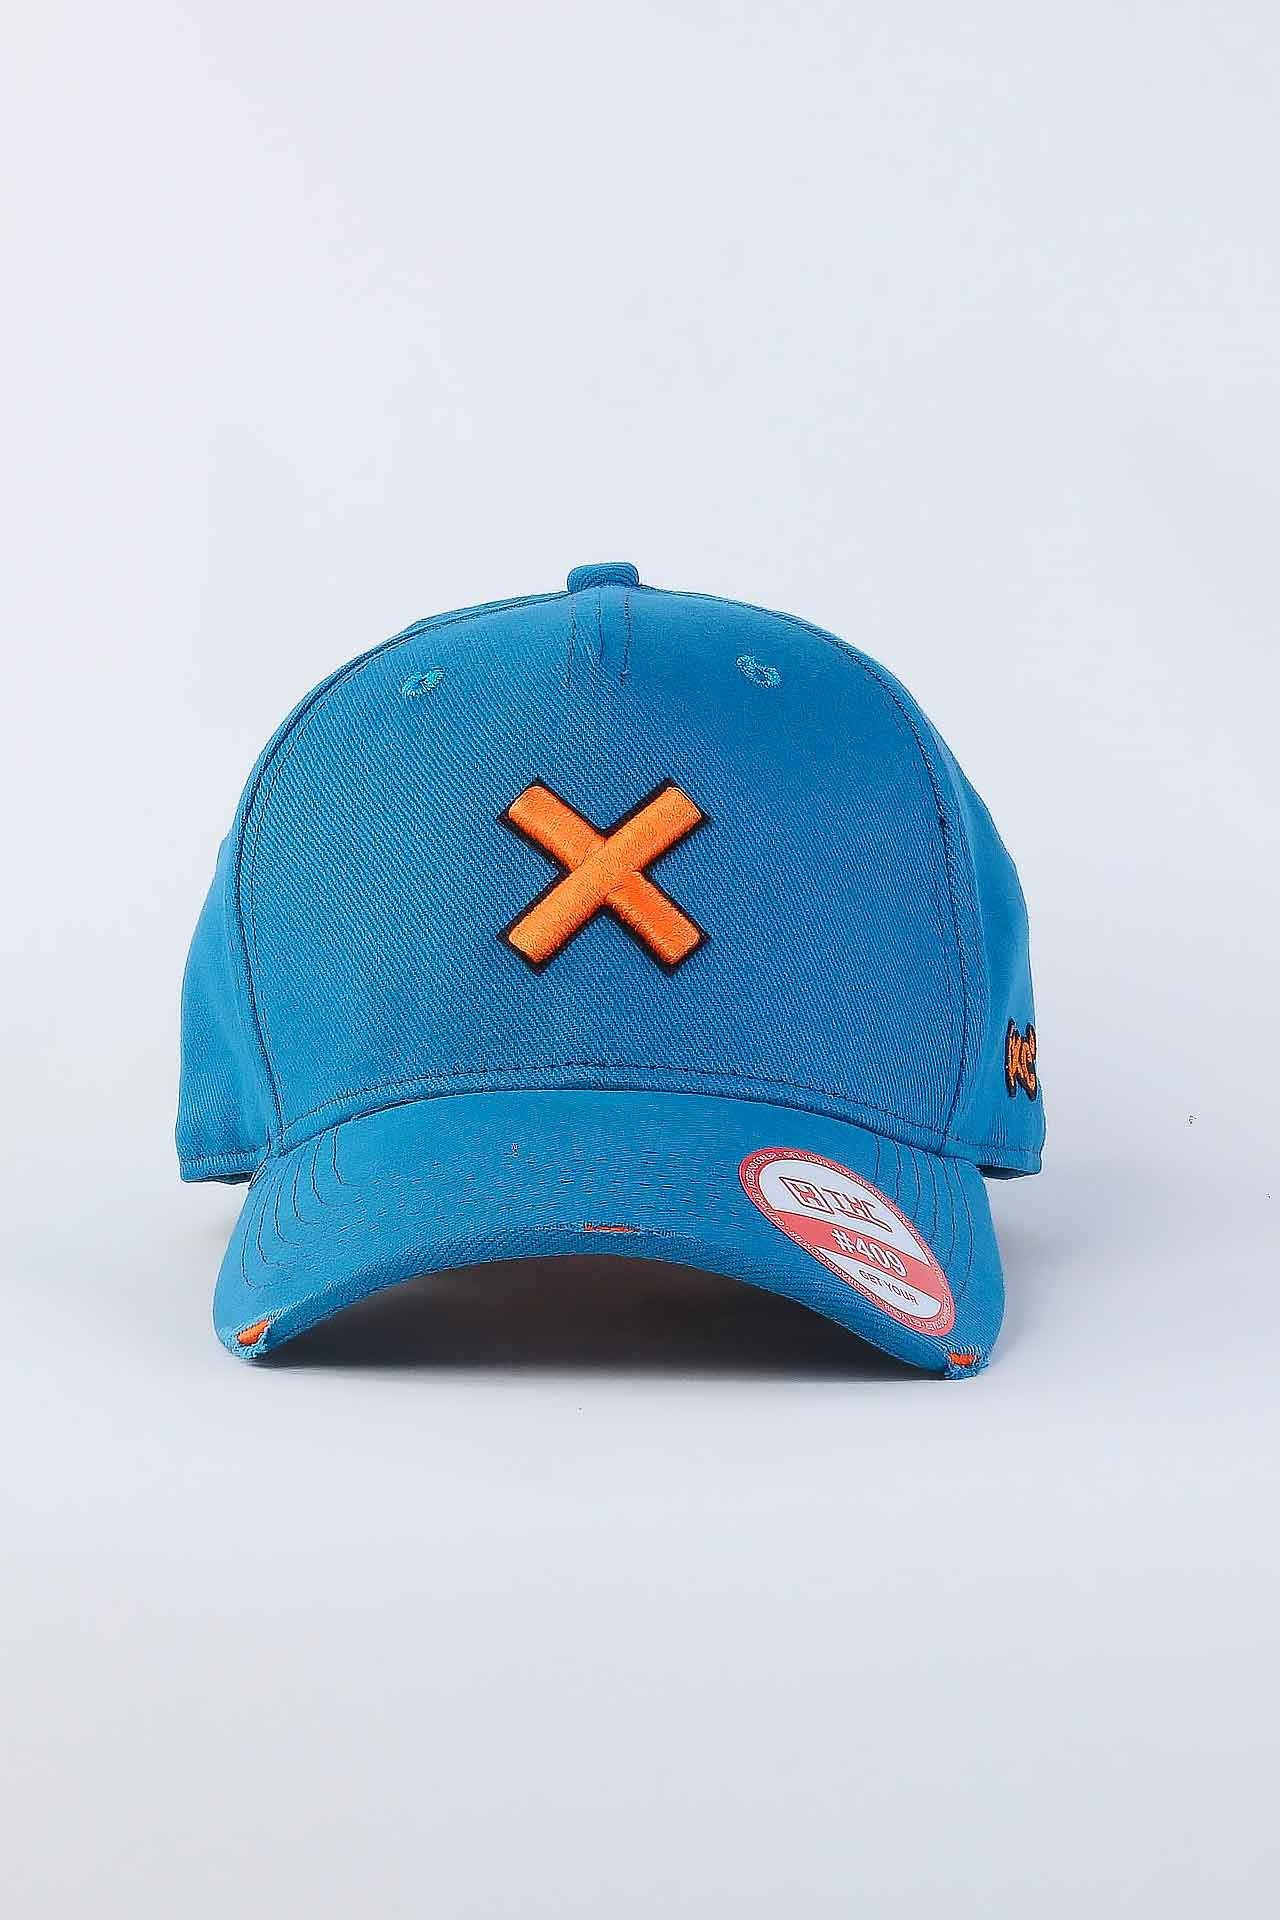 Boné TXC Brand aba curva 764C